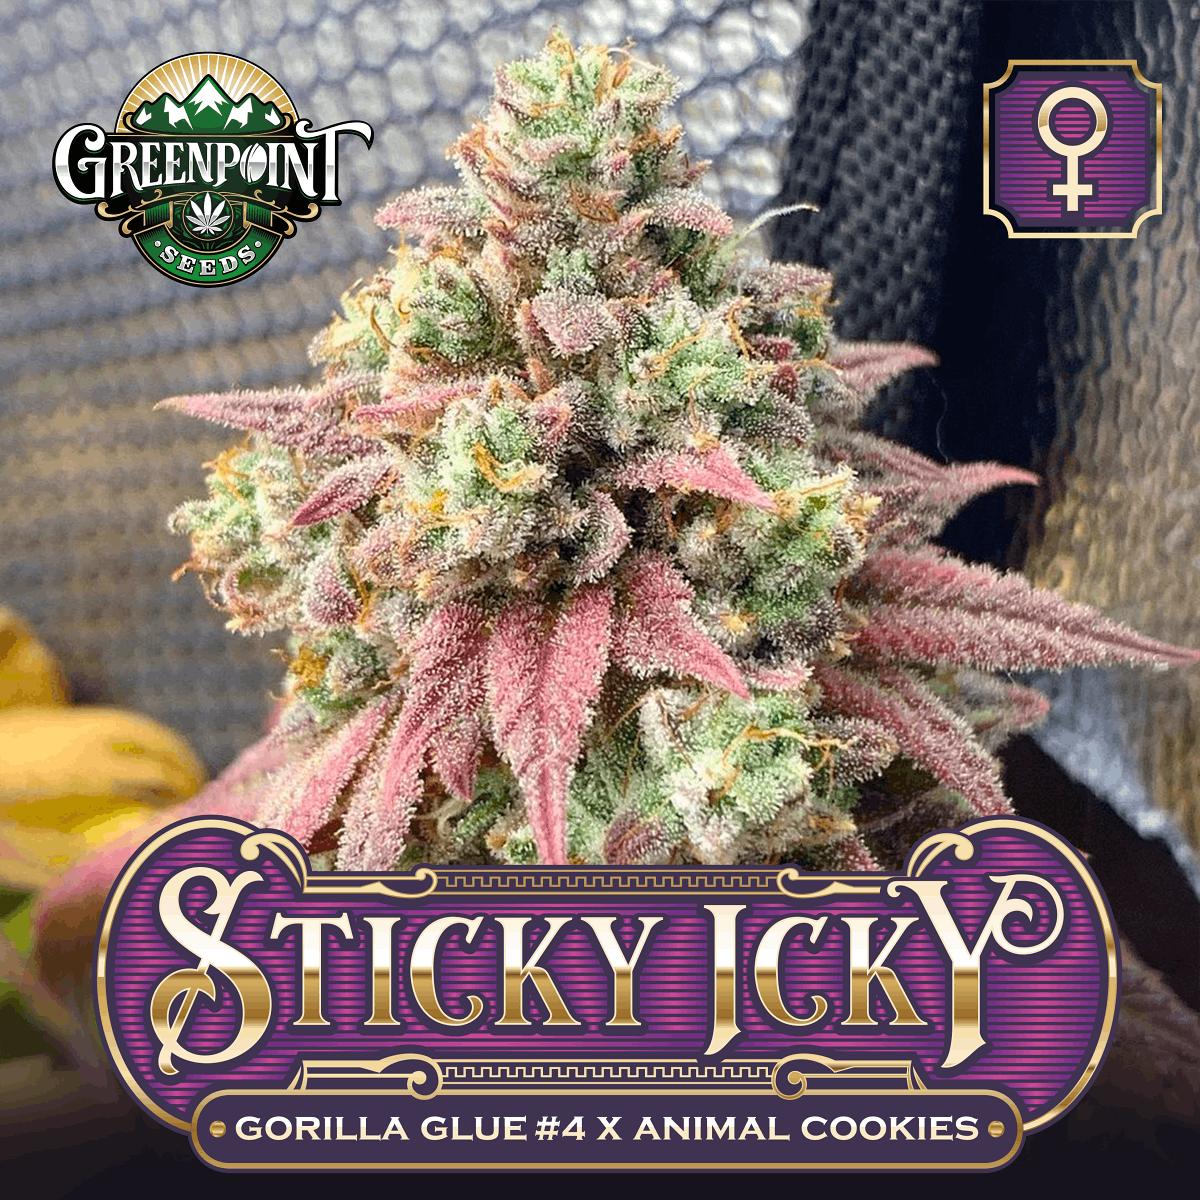 Sticky Icky Cannabis Seeds - Gorilla Glue x Animal Cookies | Greenpoint Seeds